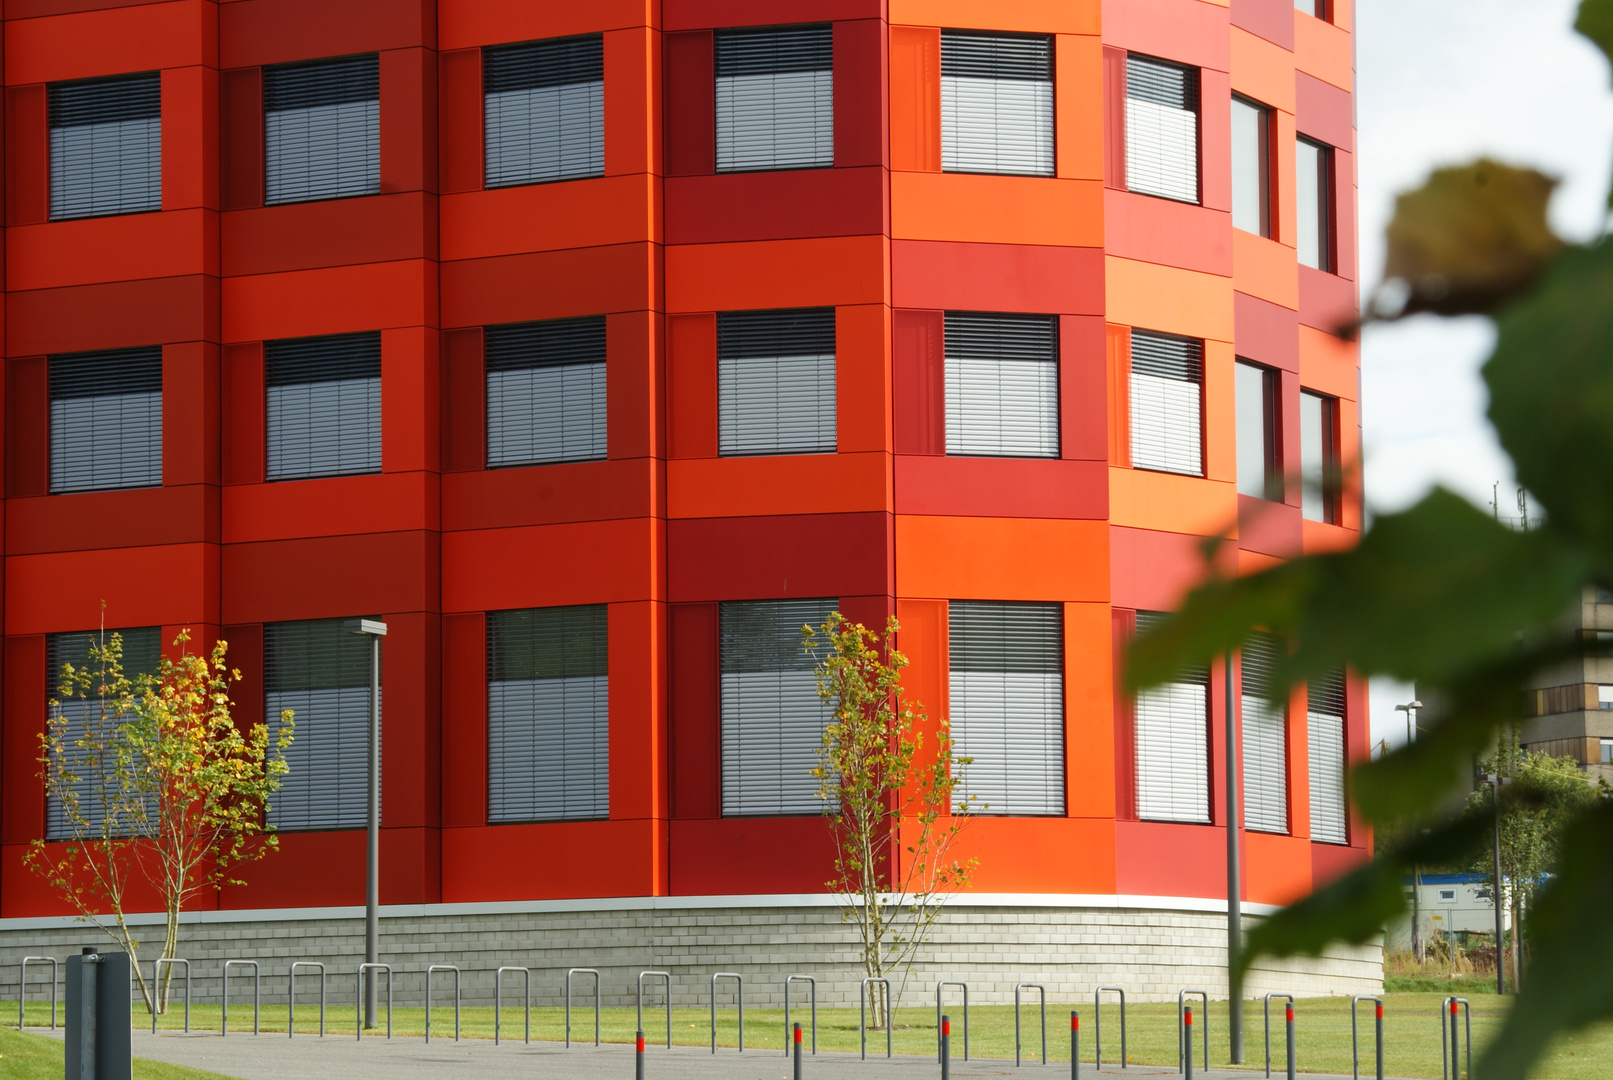 Rote Fassade Foto Bild Architektur Rot Fassade Bilder